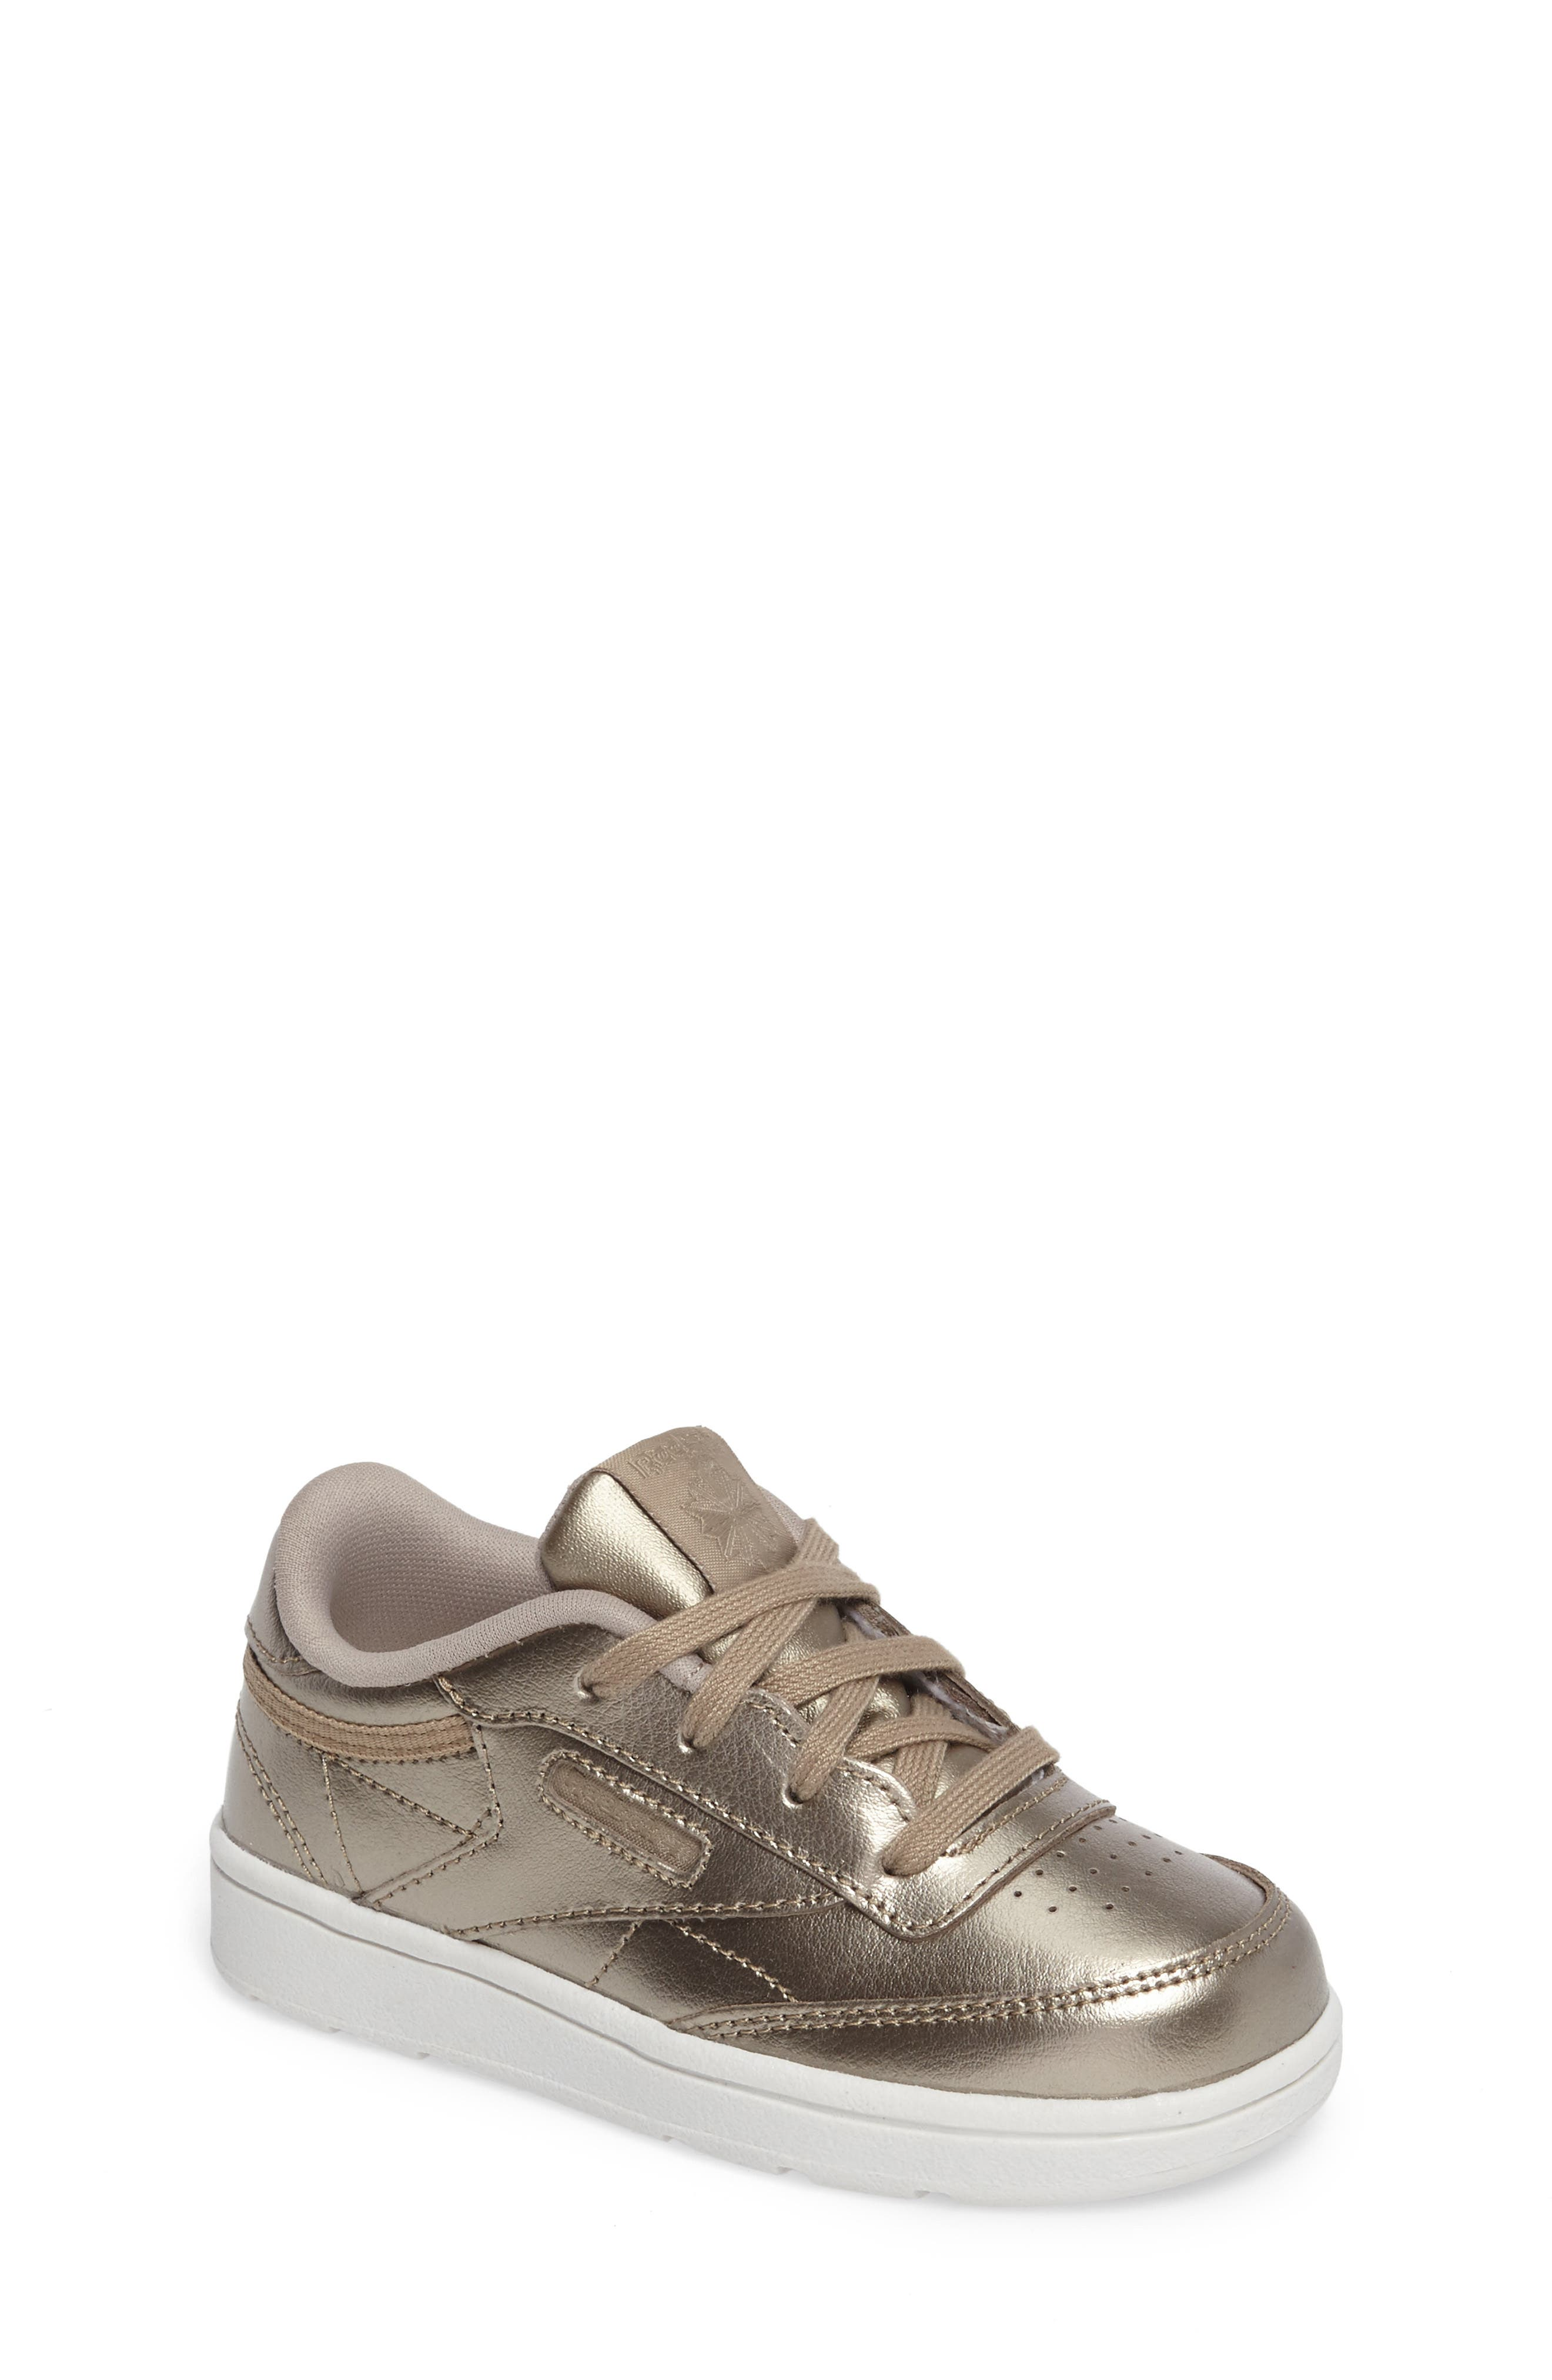 Reebok Club C Melted Metallic Sneaker (Baby, Walker & Toddler)